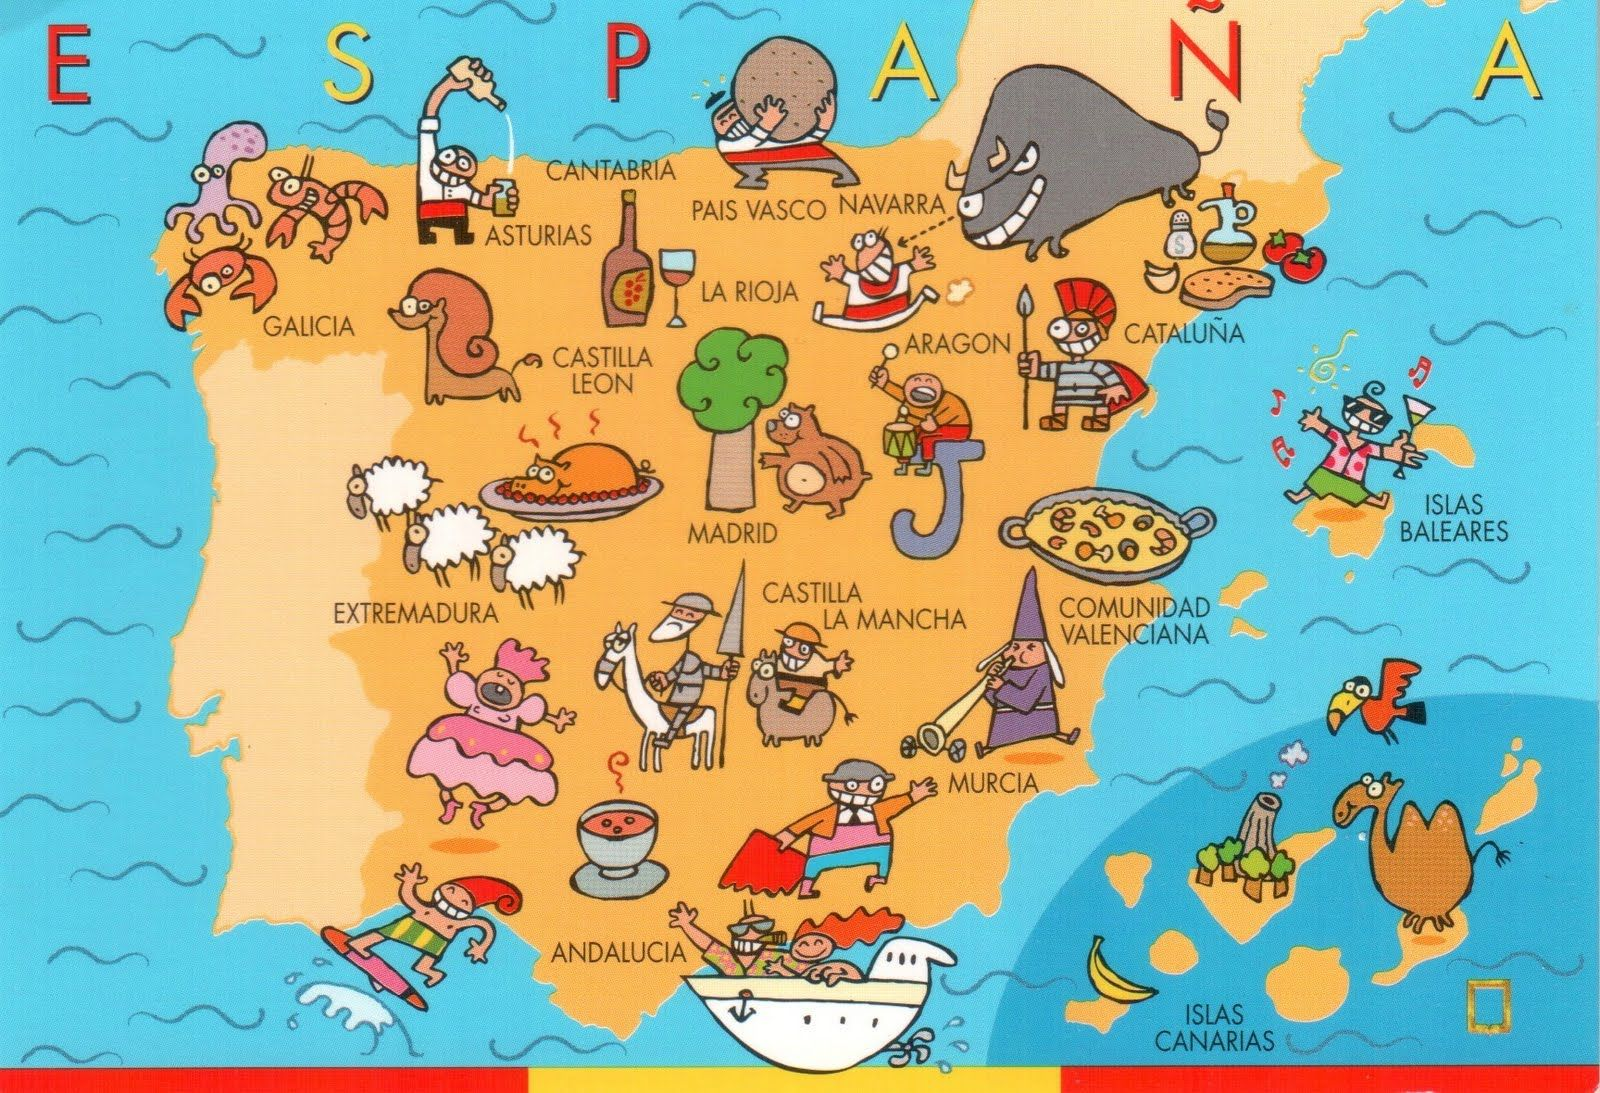 Map Of Spain Landmarks.Map Of Spain With Landmarks International Culture Spain Map Of